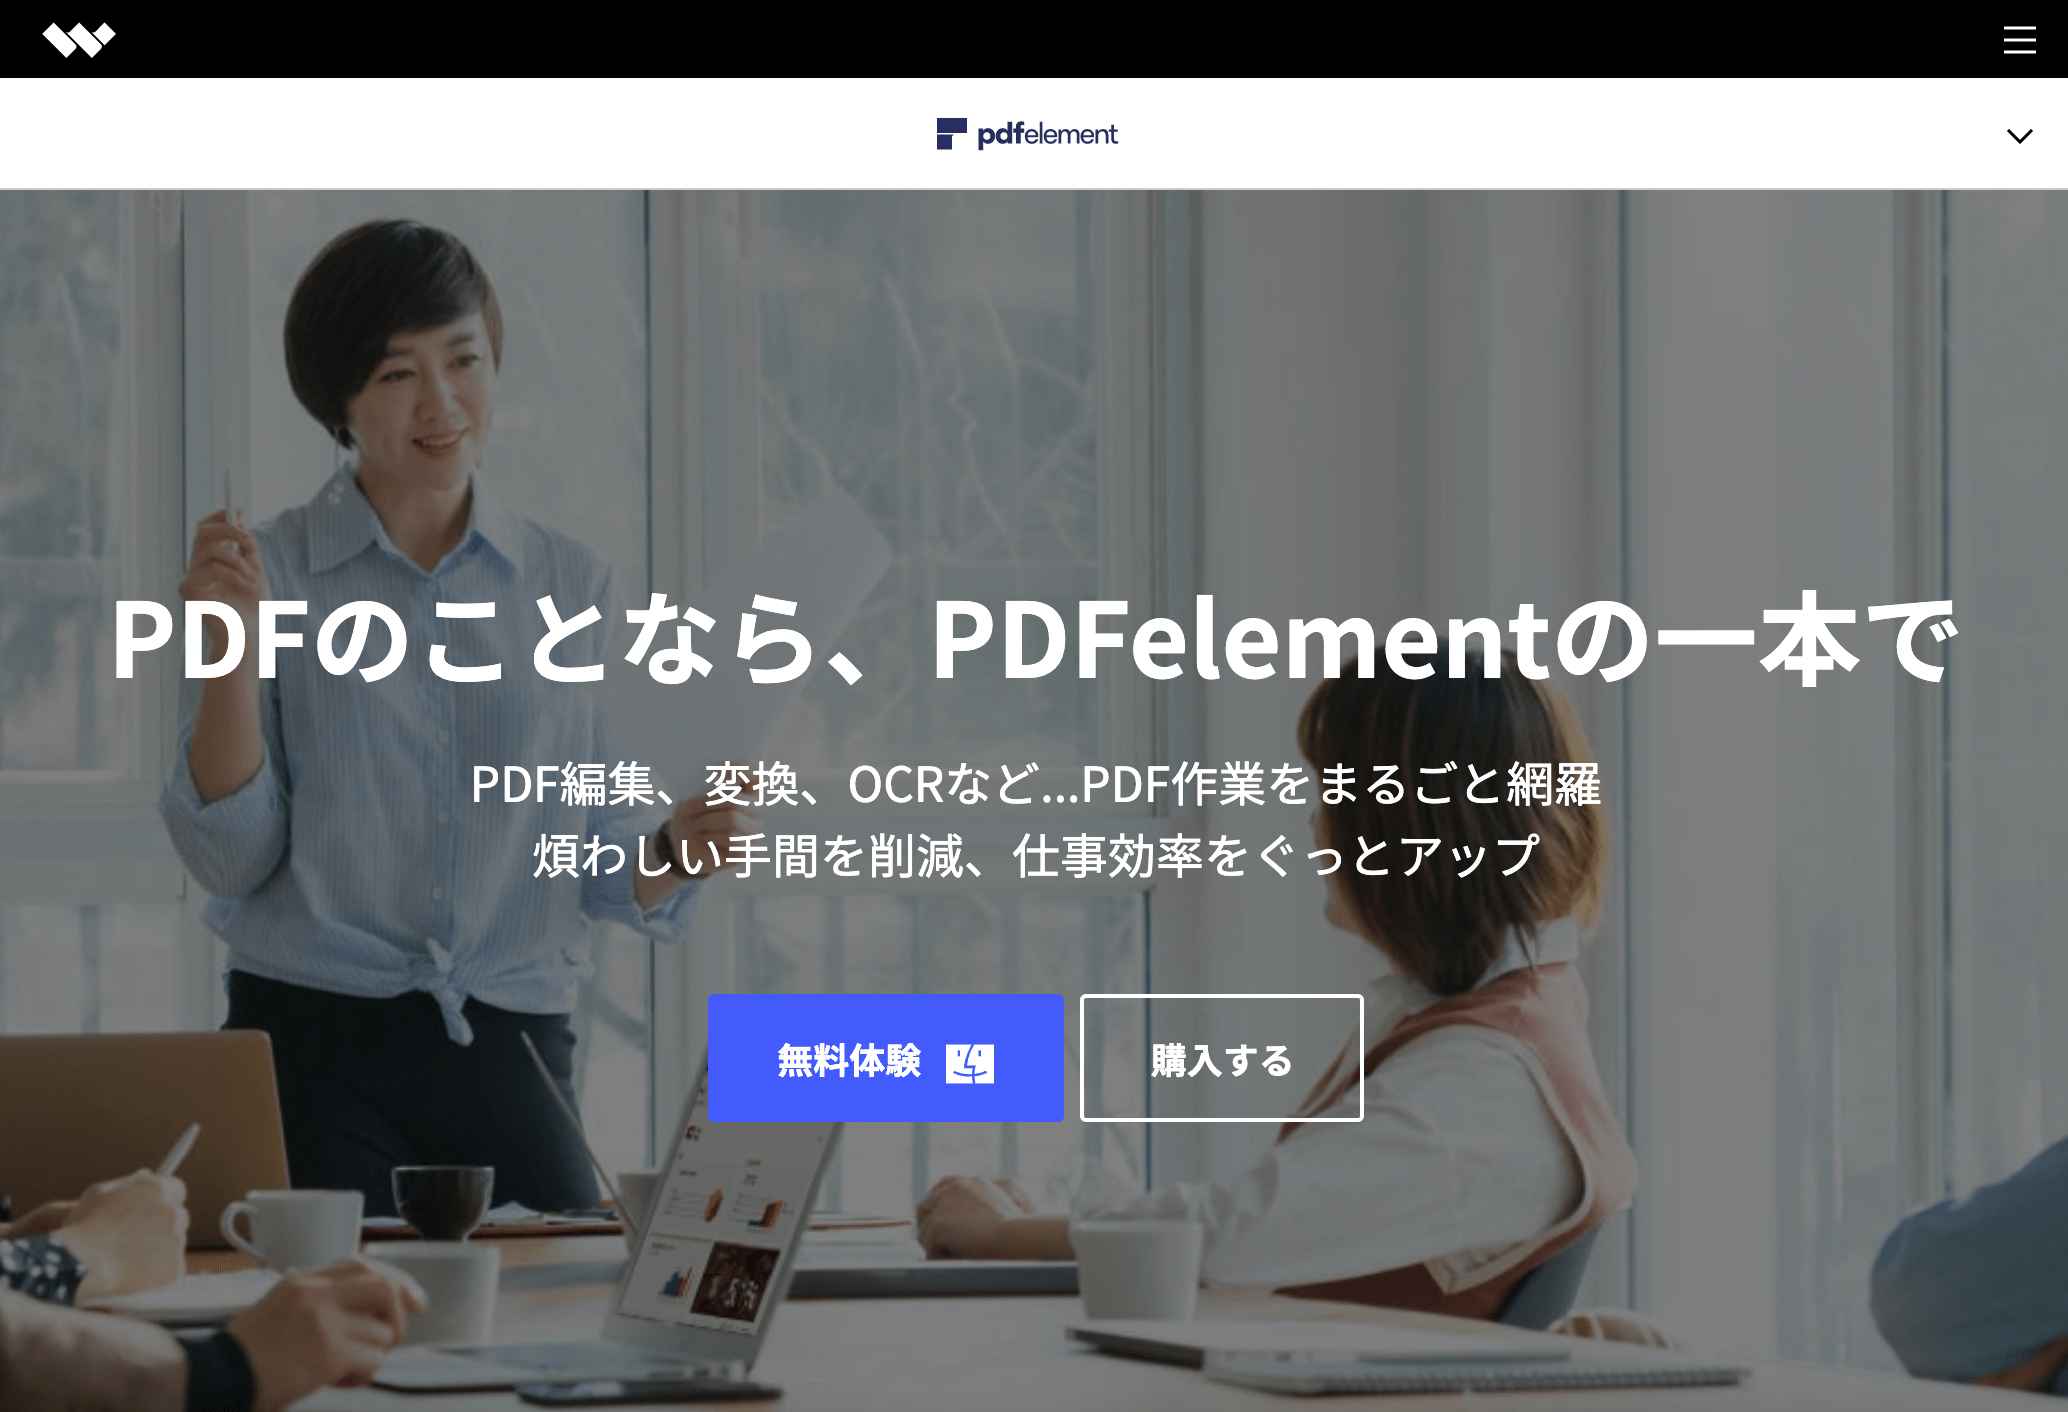 pdfelement.png